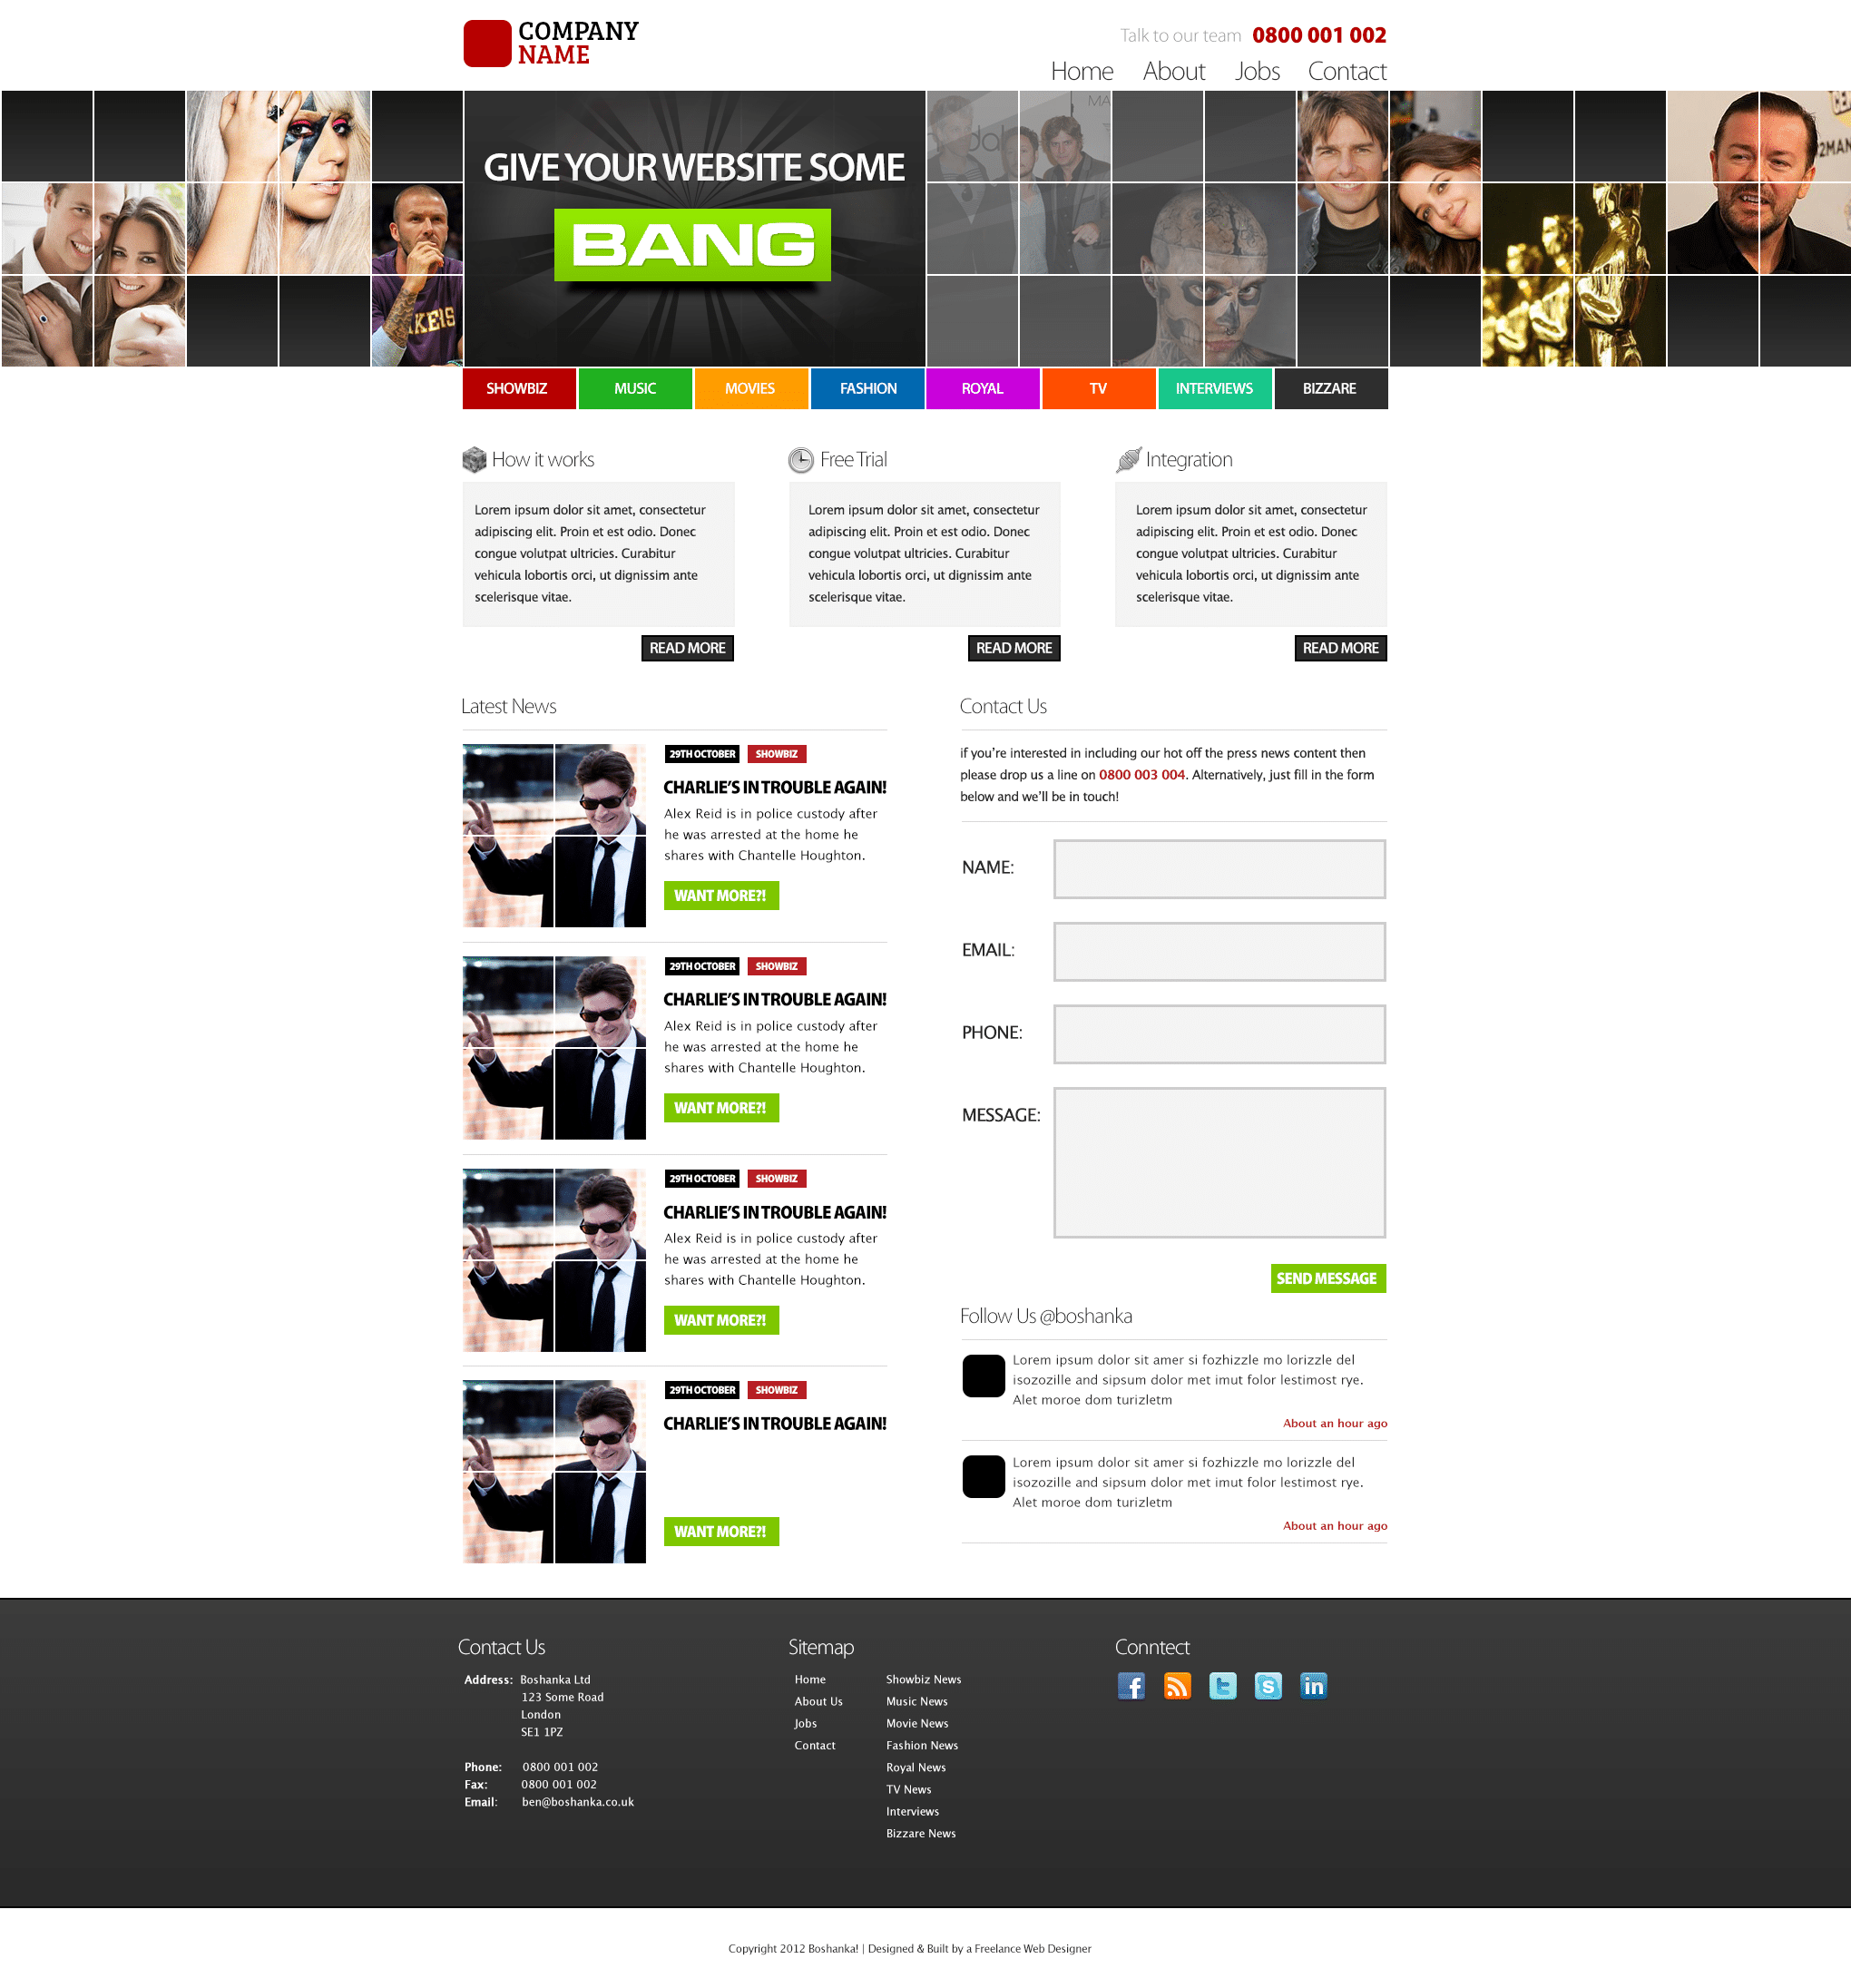 photoshop tutorials for web design pdf free download